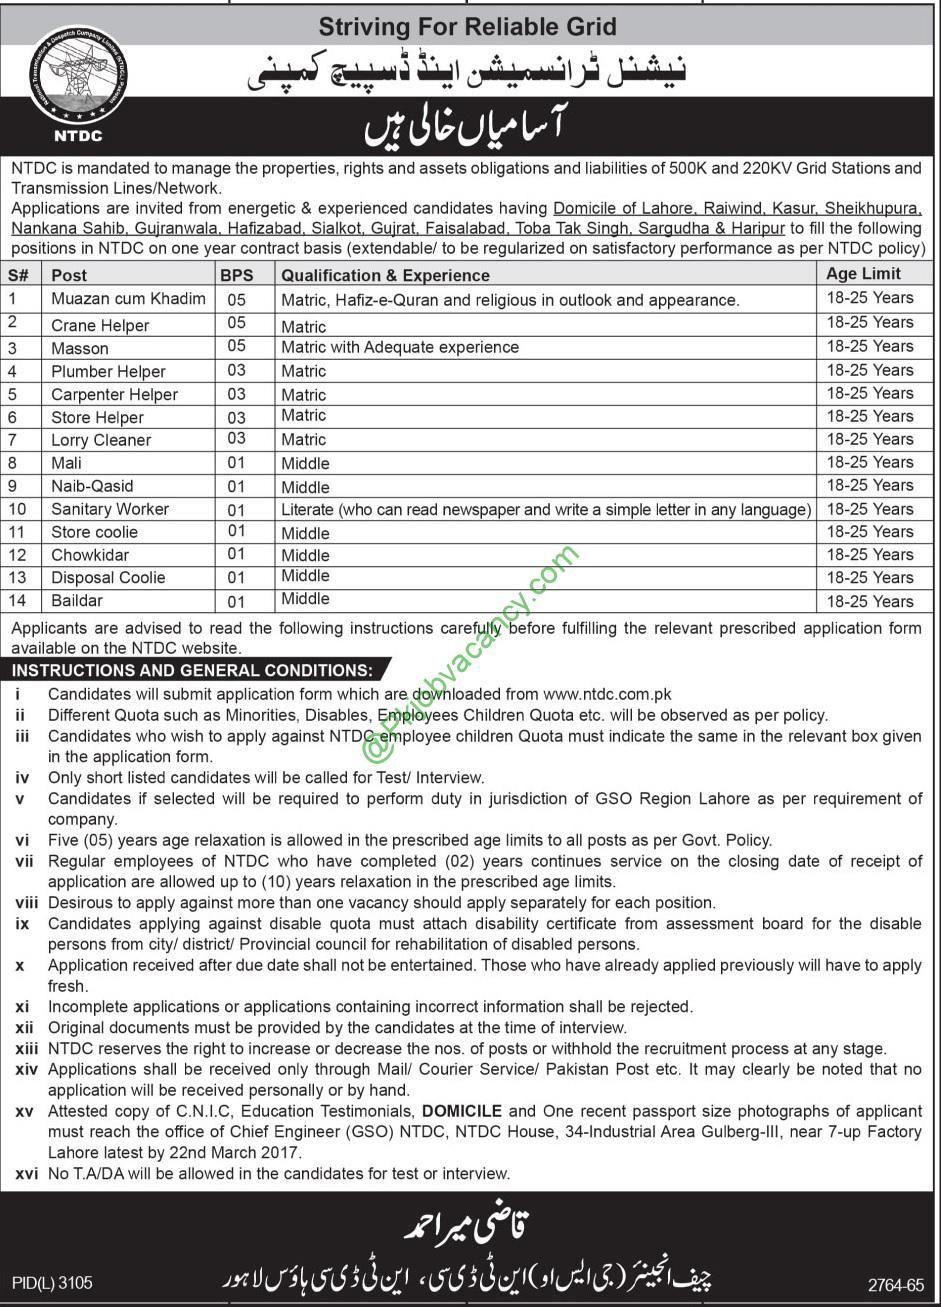 National Transmission & Despatch Company 2017 NTDC Jobs Application ...